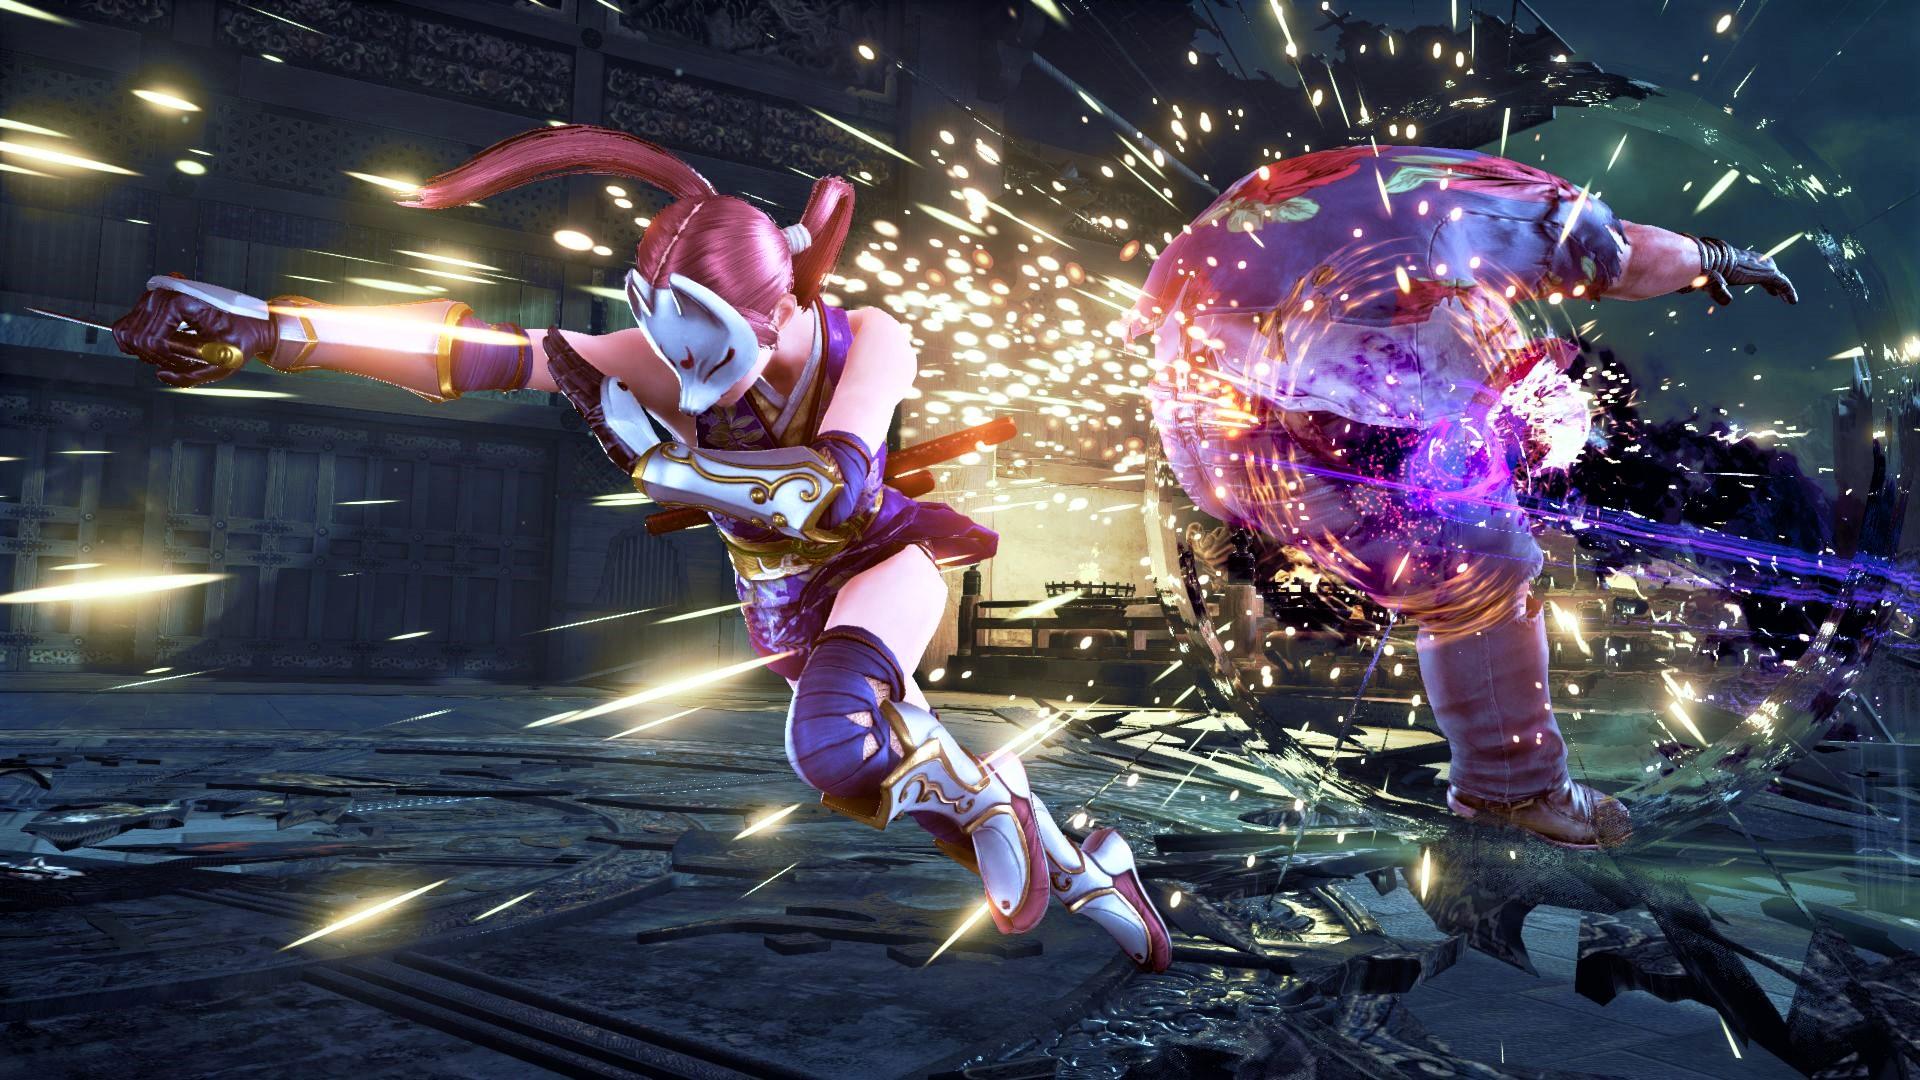 Tekken 7 V4 00 Patch Notes News Avoiding The Puddle